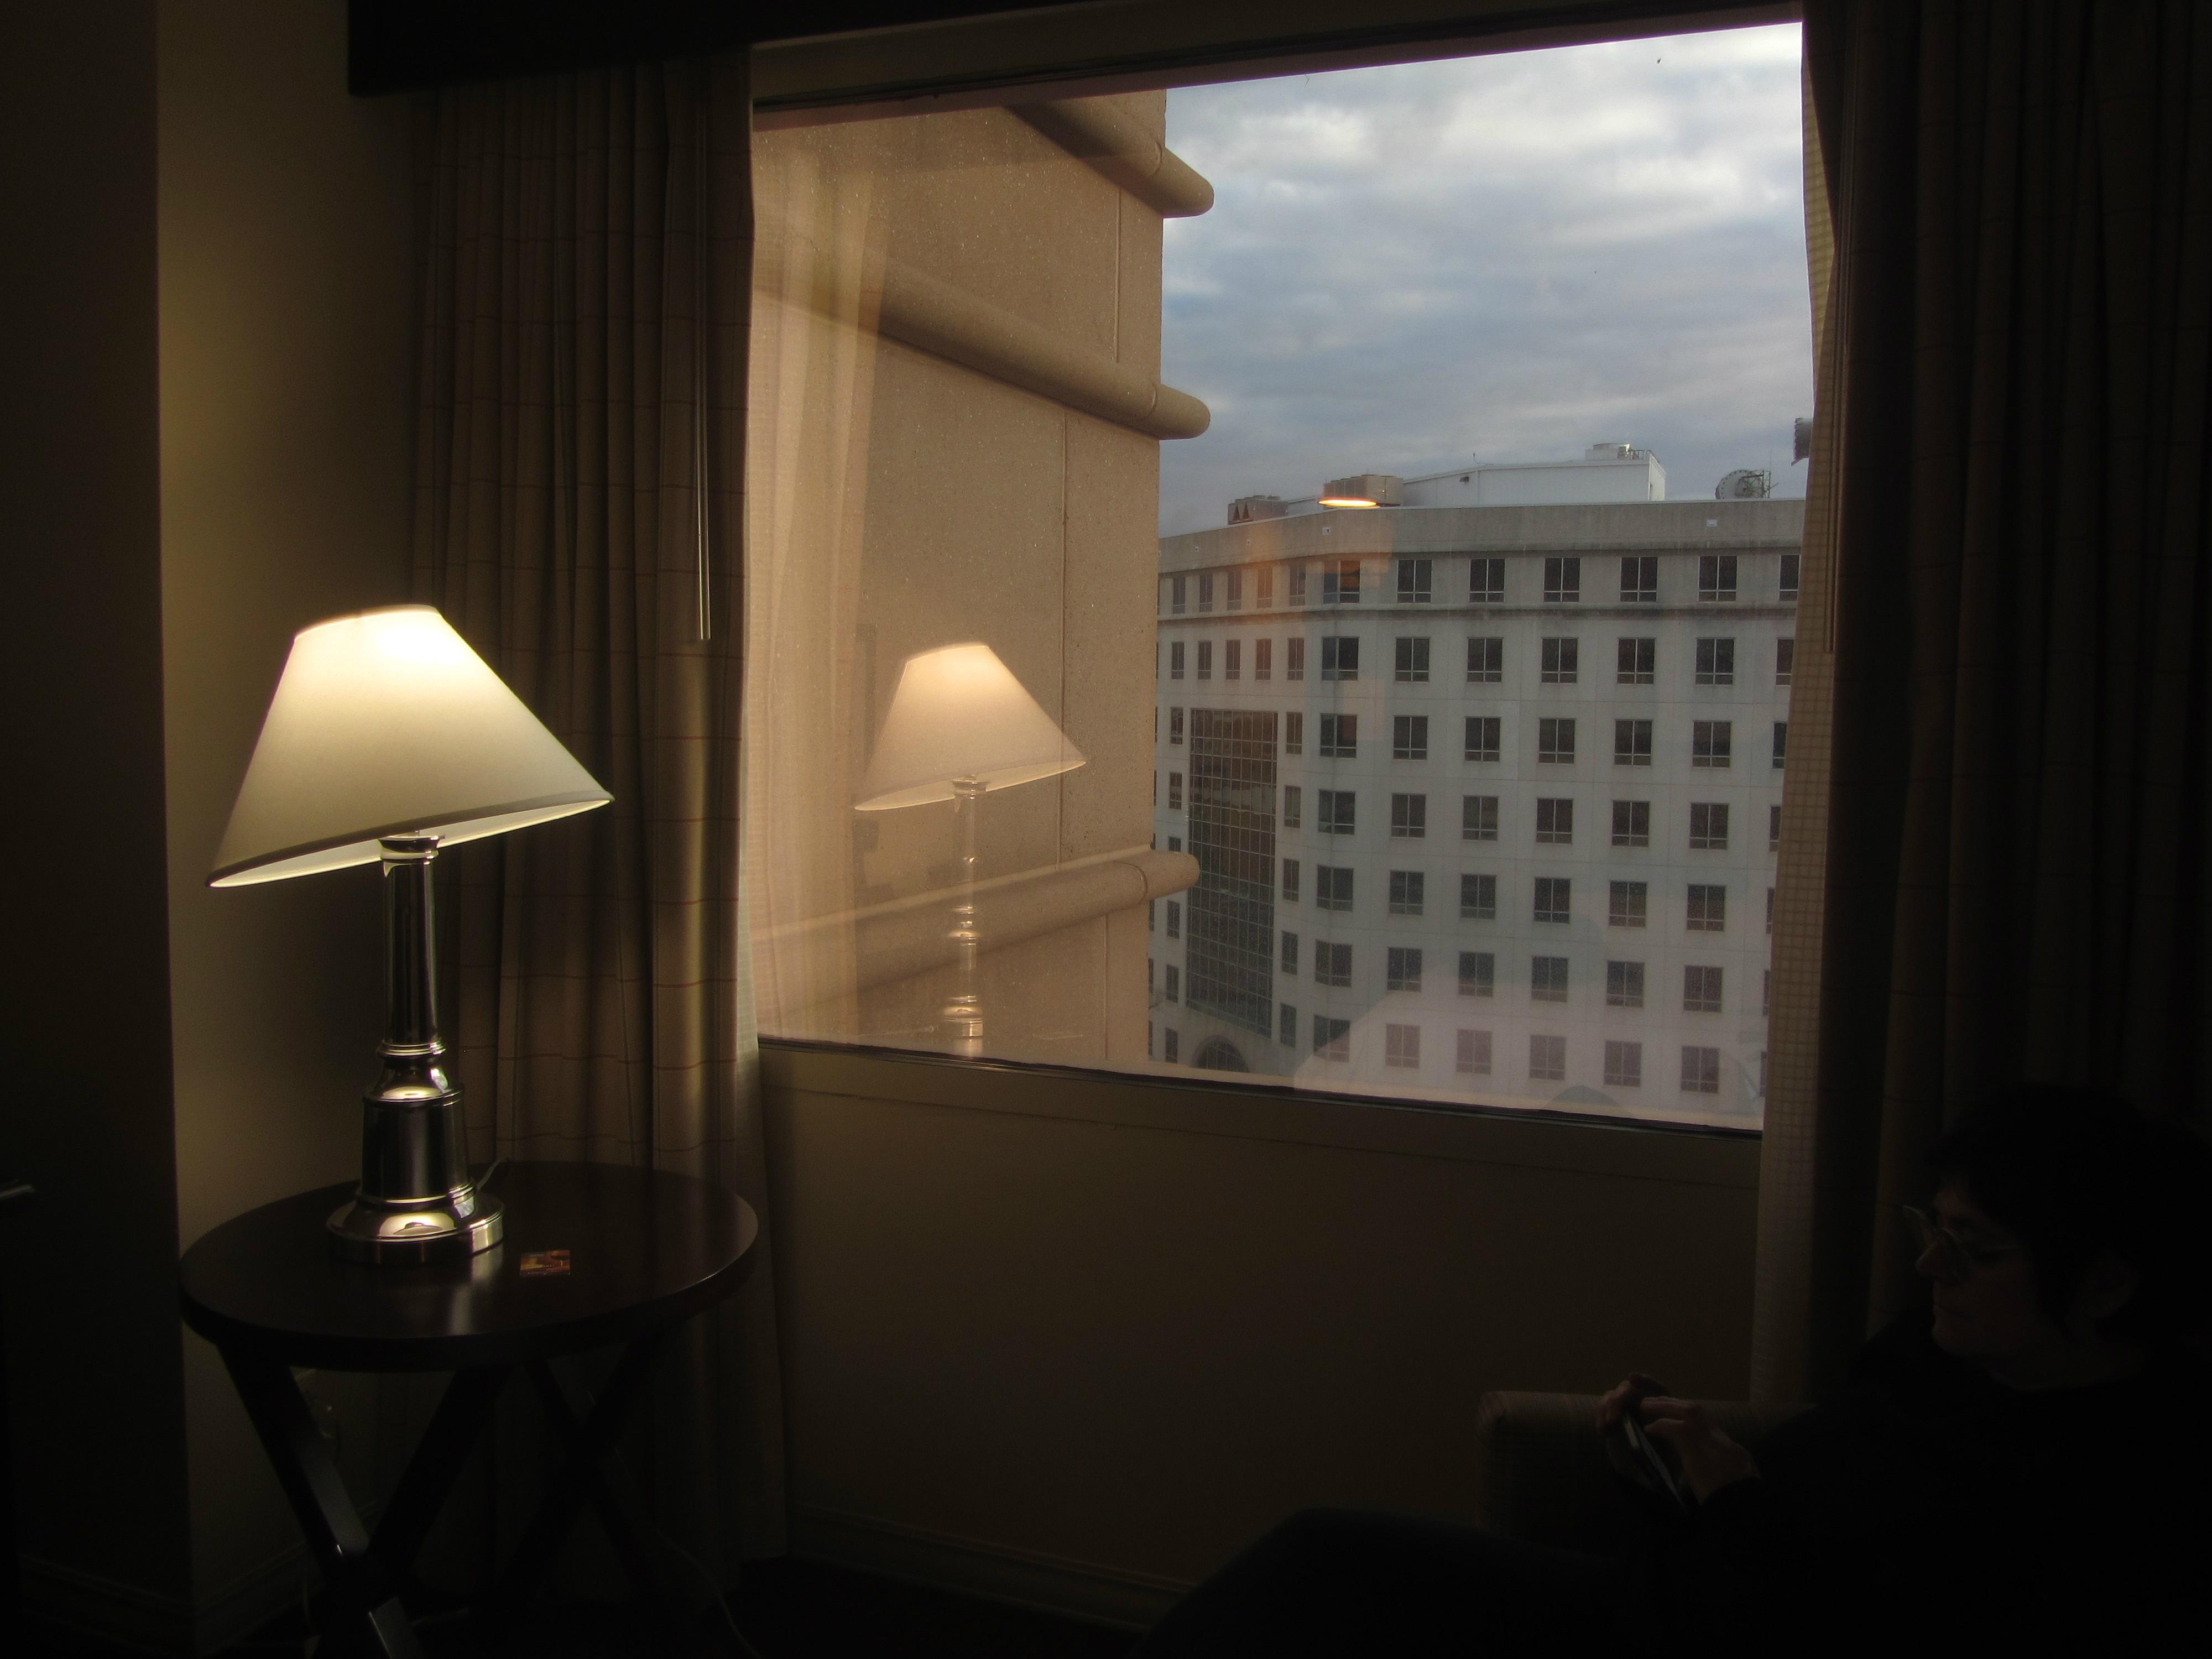 Fondos de pantalla : ventana, Paisaje urbano, arquitectura, edificio ...